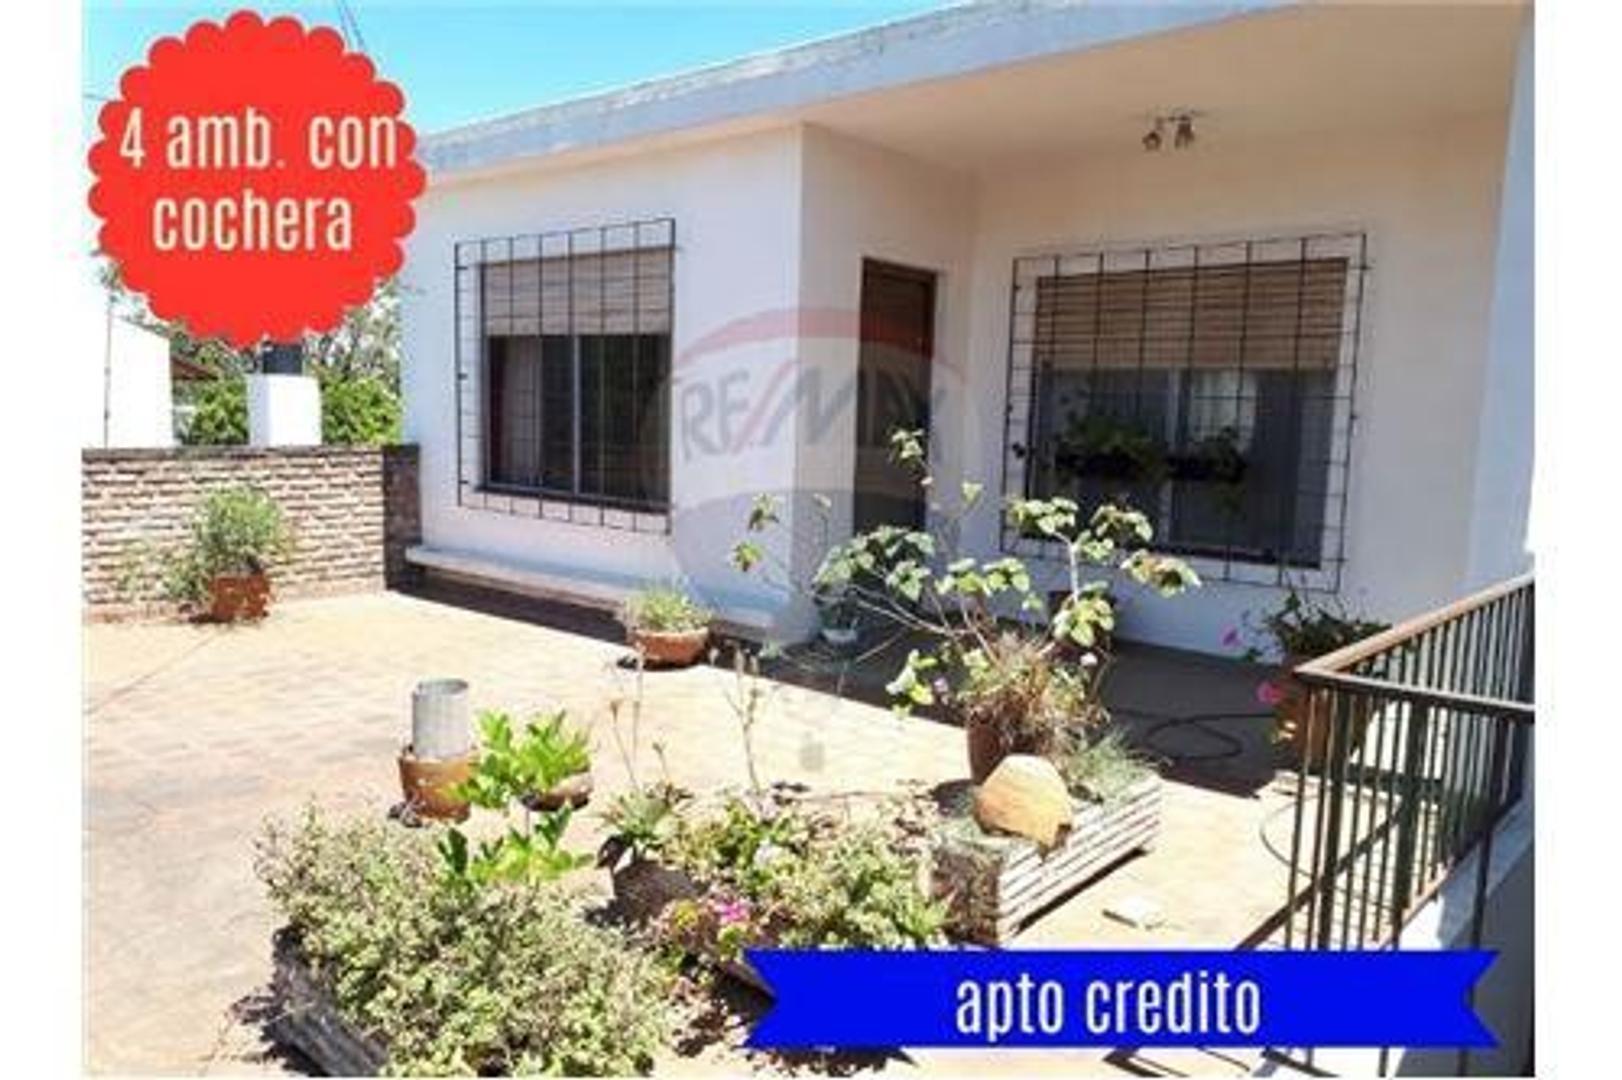 Ph 4 amb. terraza Cochera Quilmes Apto Crédito